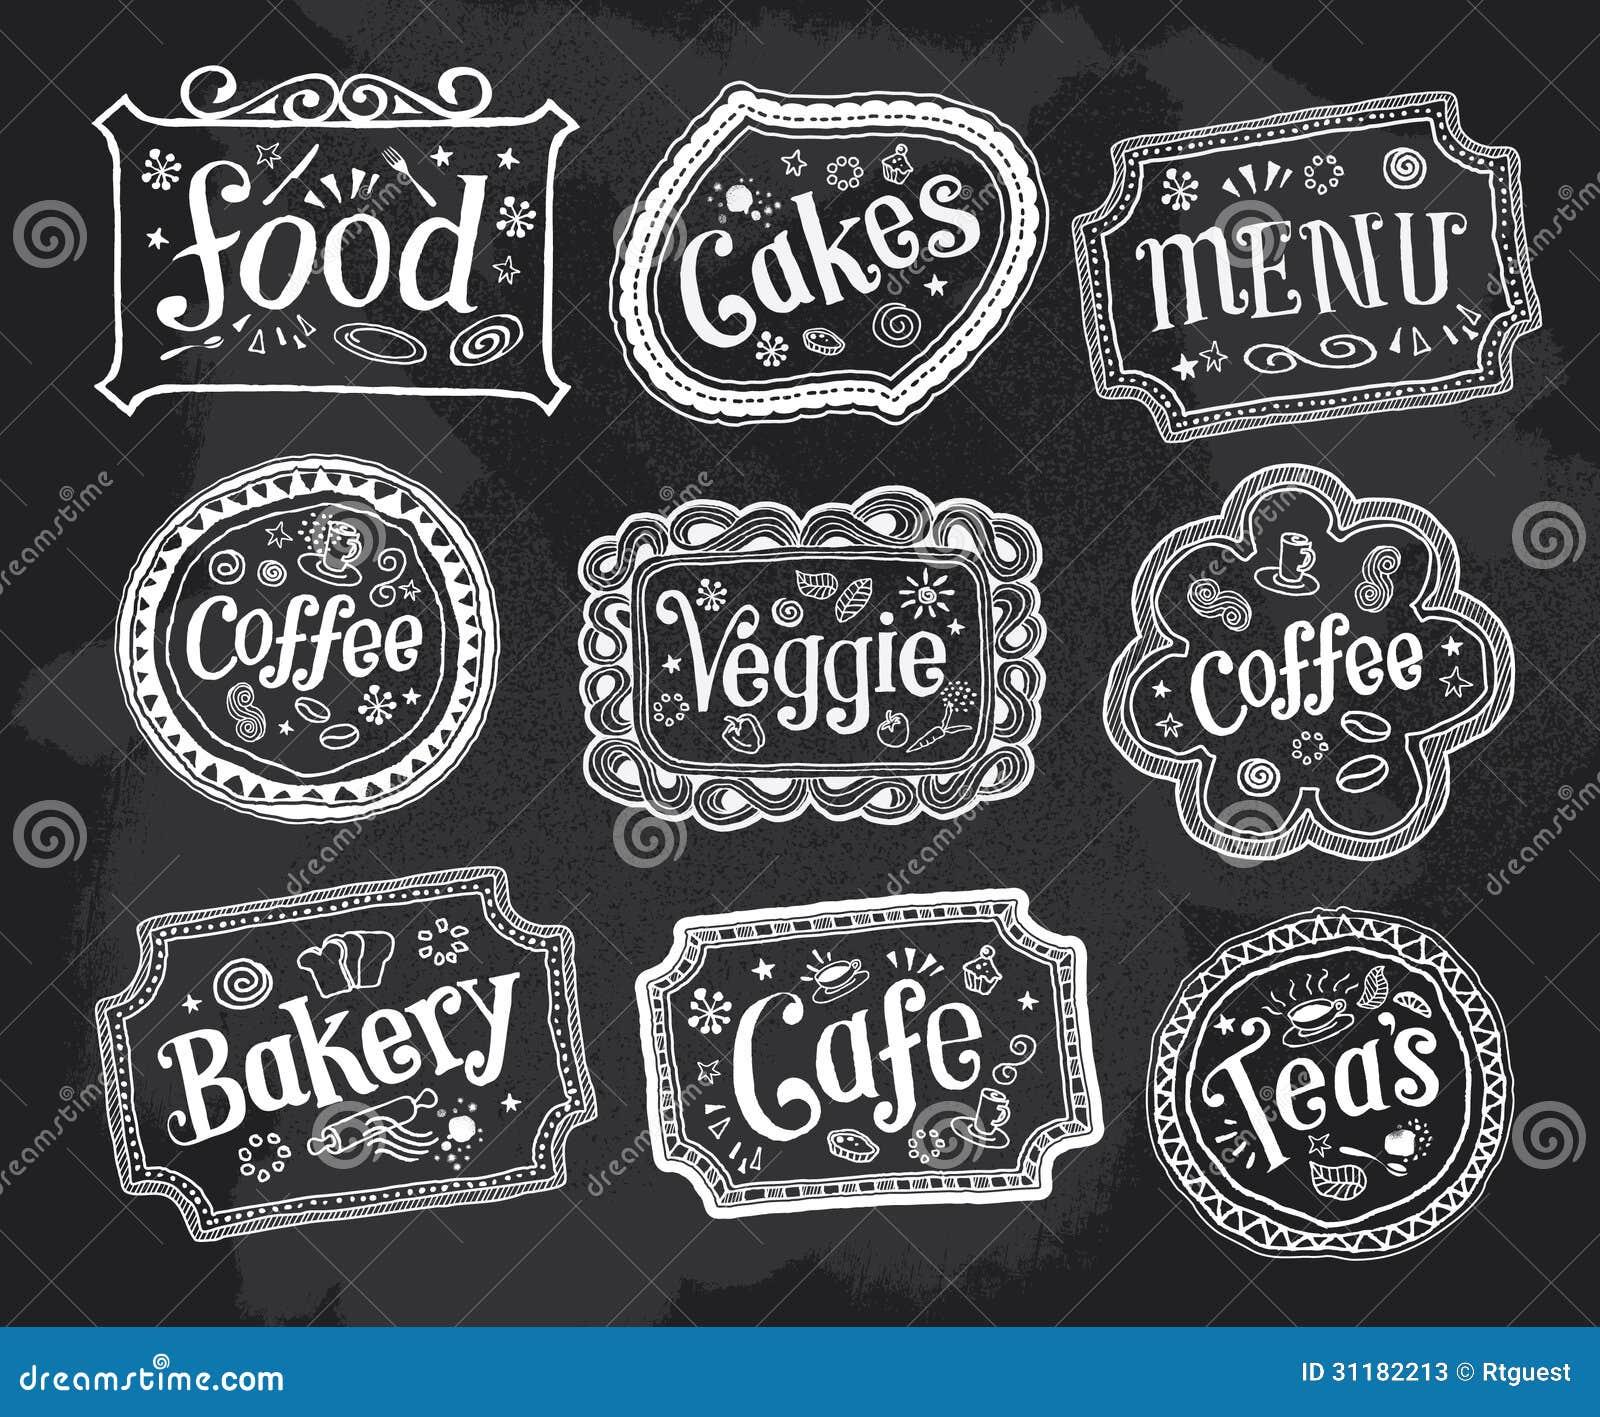 Blackboard, Frame, Signs, Hand Drawn Doodles Stock Photos